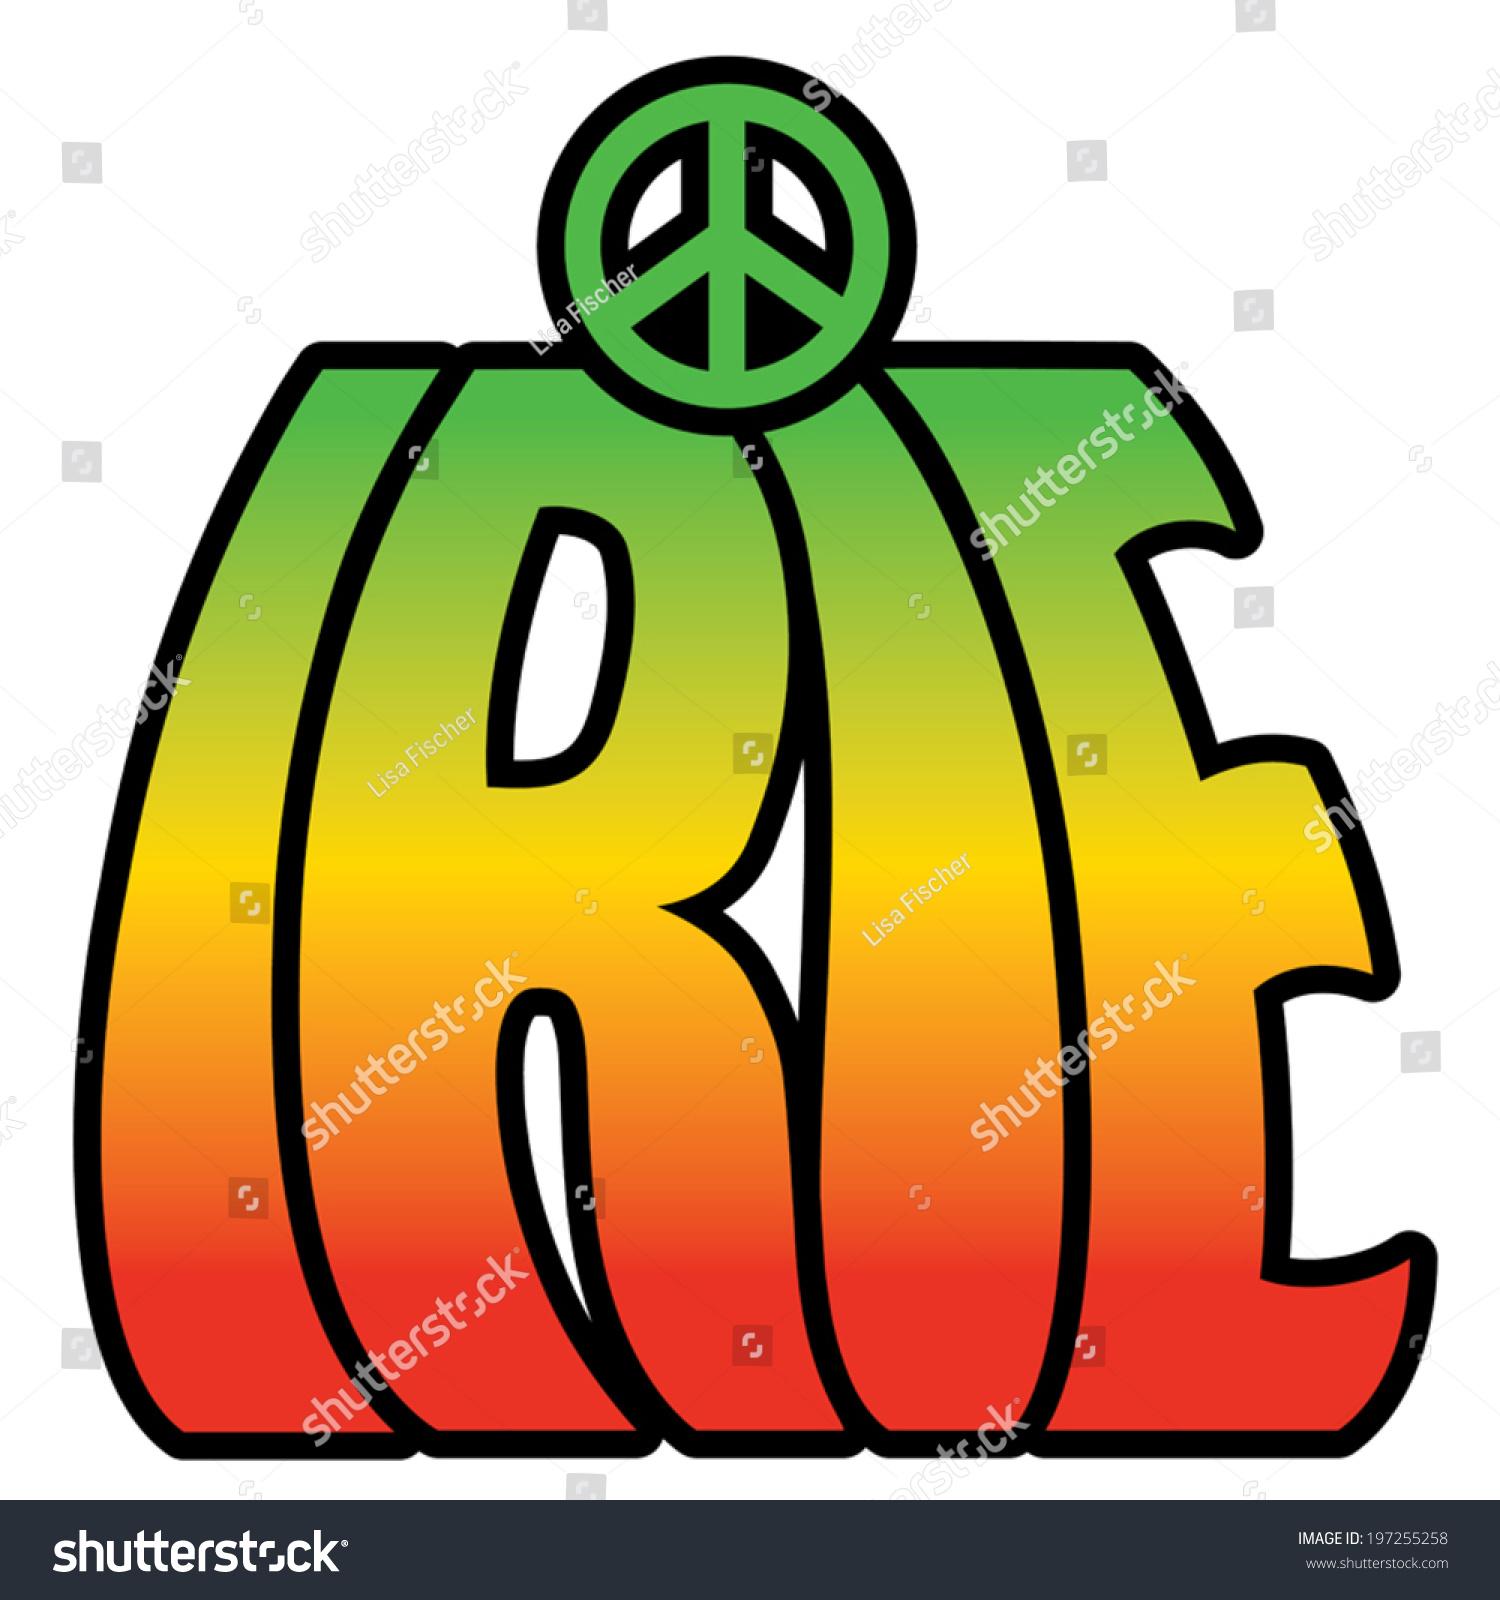 Irie text design peace symbol rastafarian stock vector 197255258 irie text design with peace symbol in rastafarian colors biocorpaavc Image collections